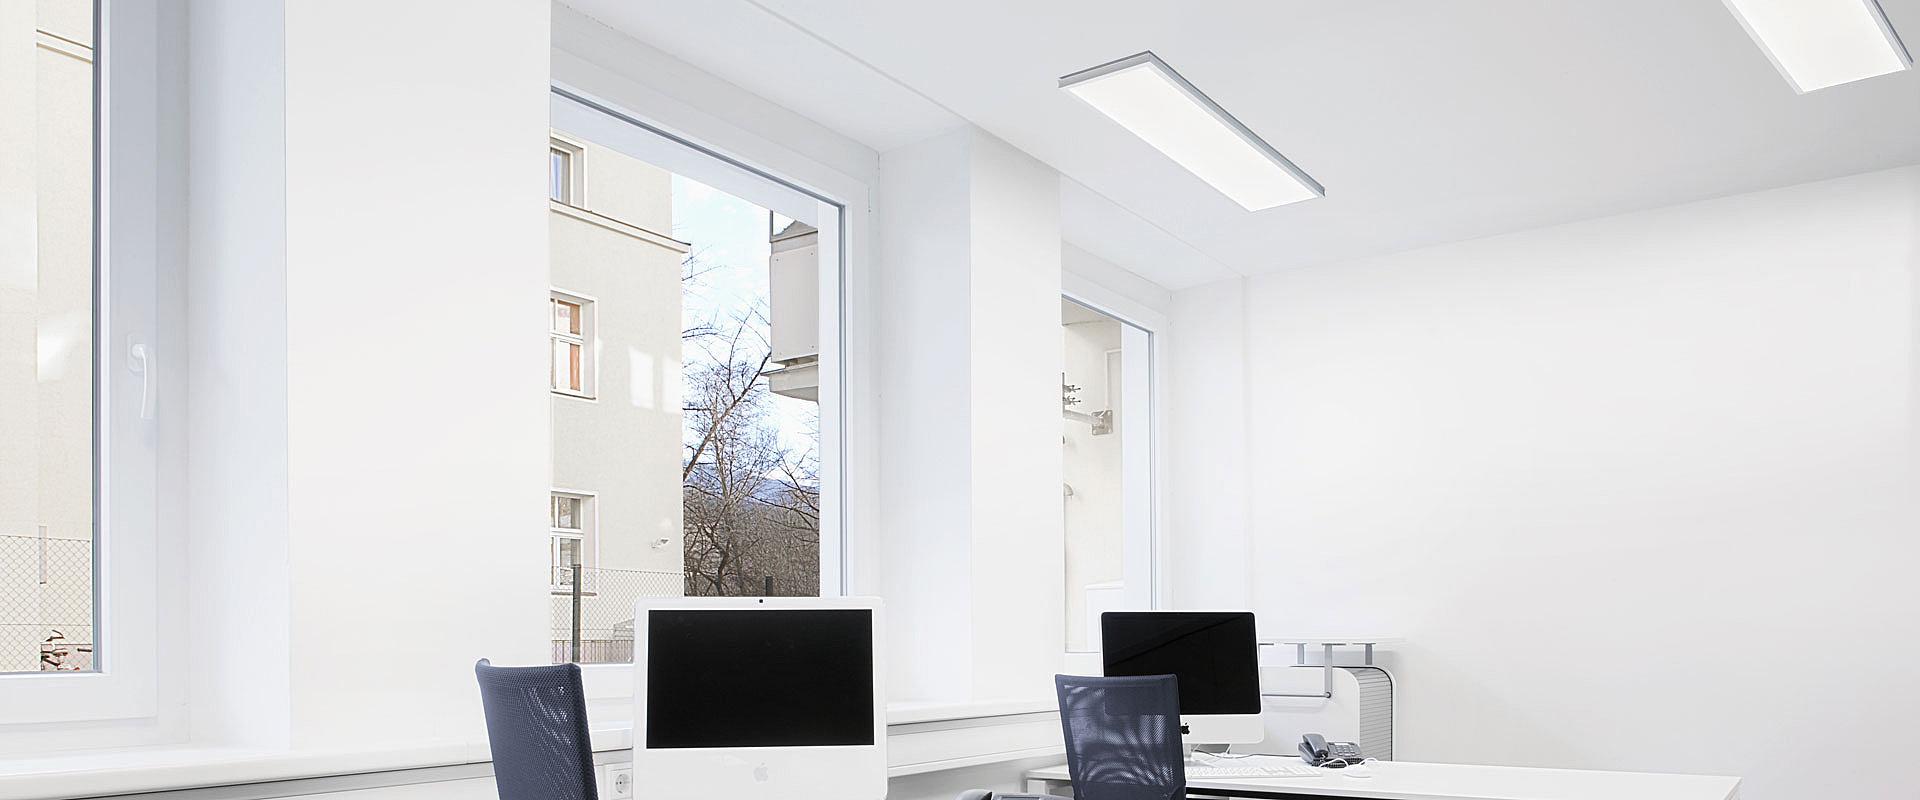 eclairage bureau led cool eclairage with eclairage bureau. Black Bedroom Furniture Sets. Home Design Ideas